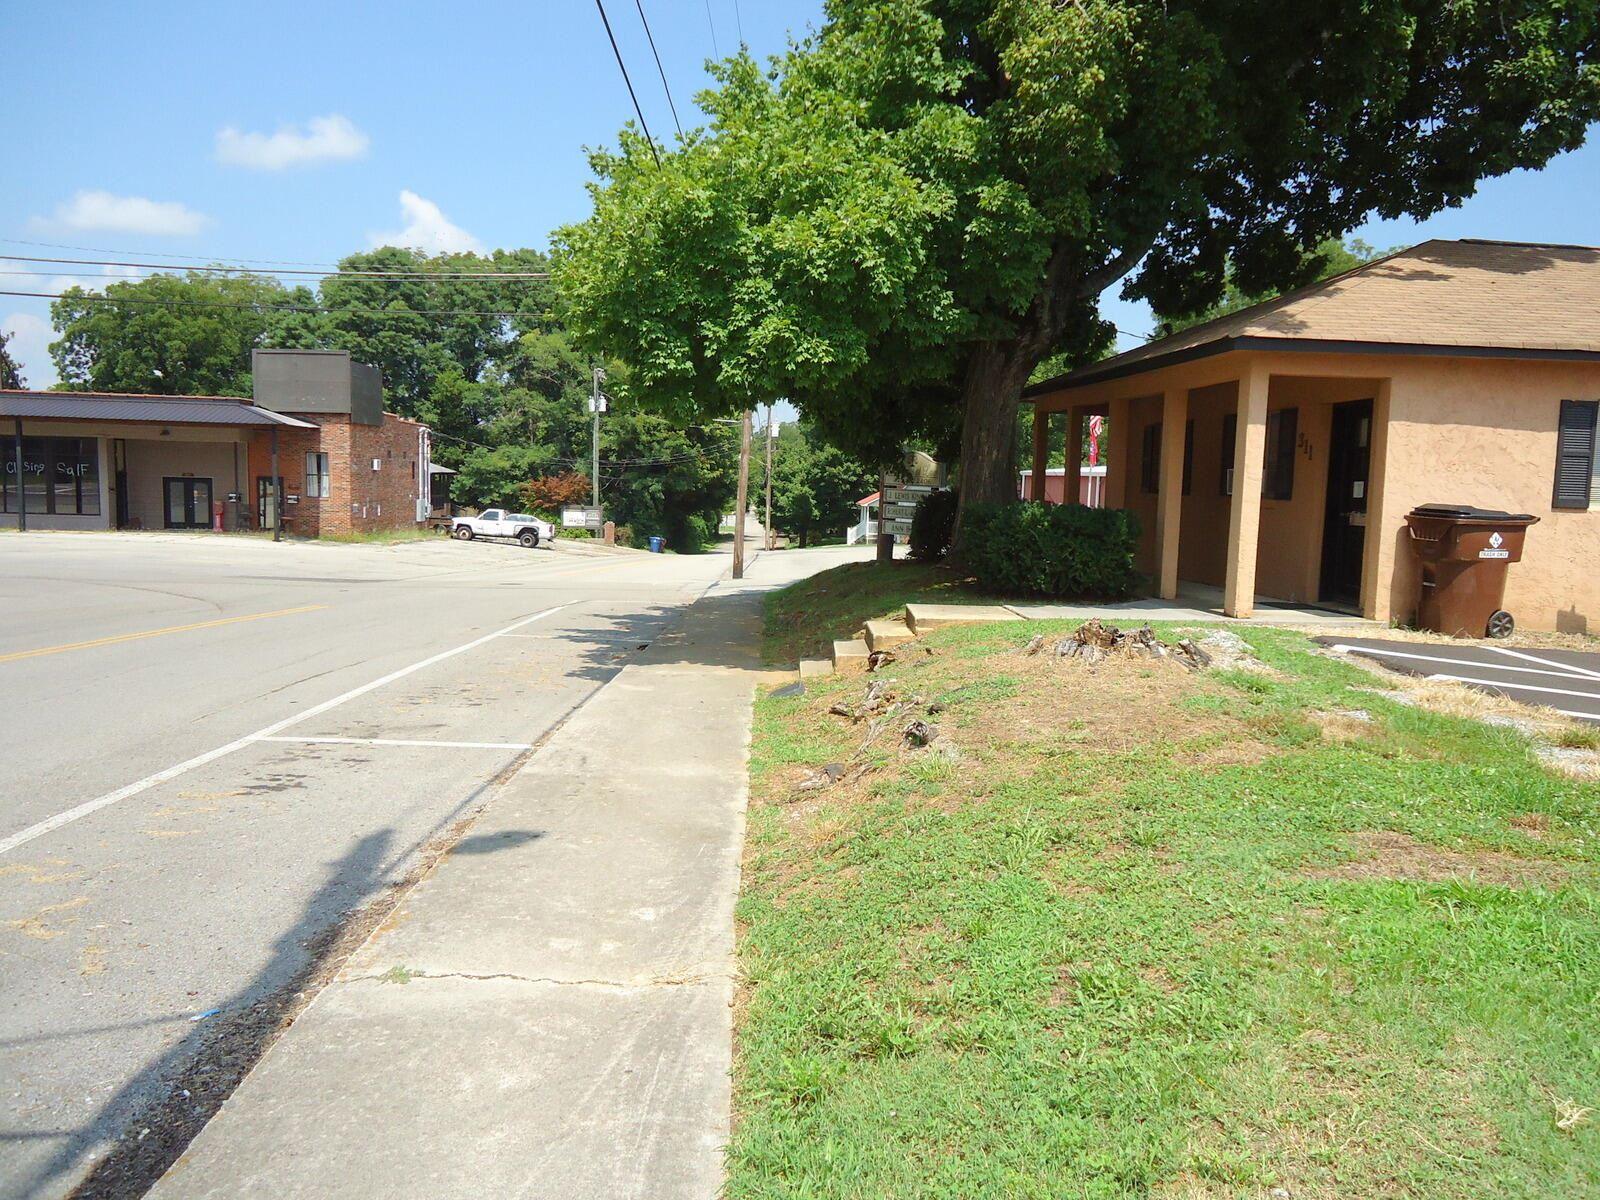 Photo of 311 N Tellico St, Madisonville, TN 37354 (MLS # 1165645)